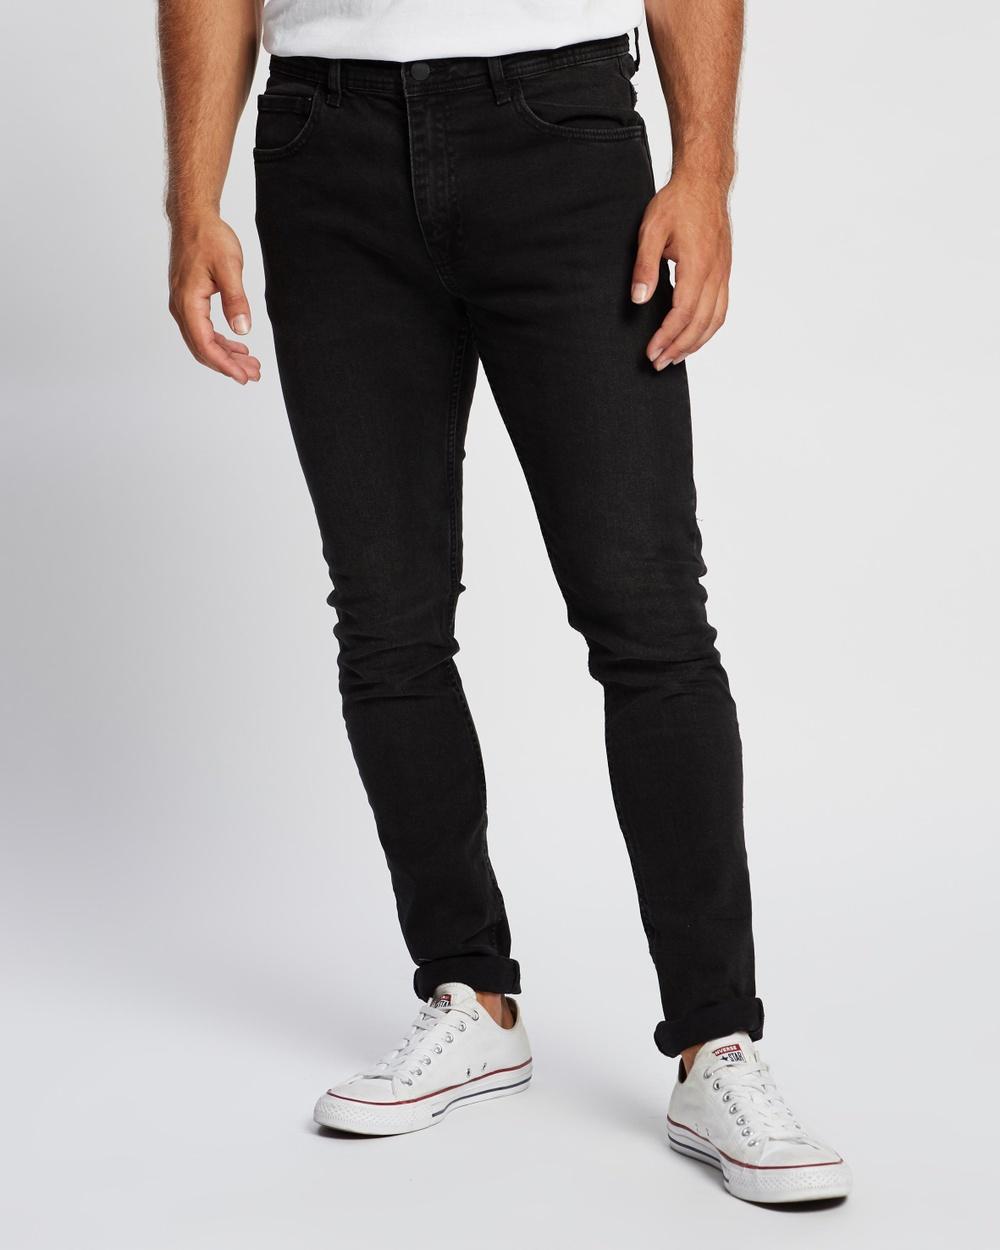 Cotton On Super Skinny Jeans Raven Black Australia